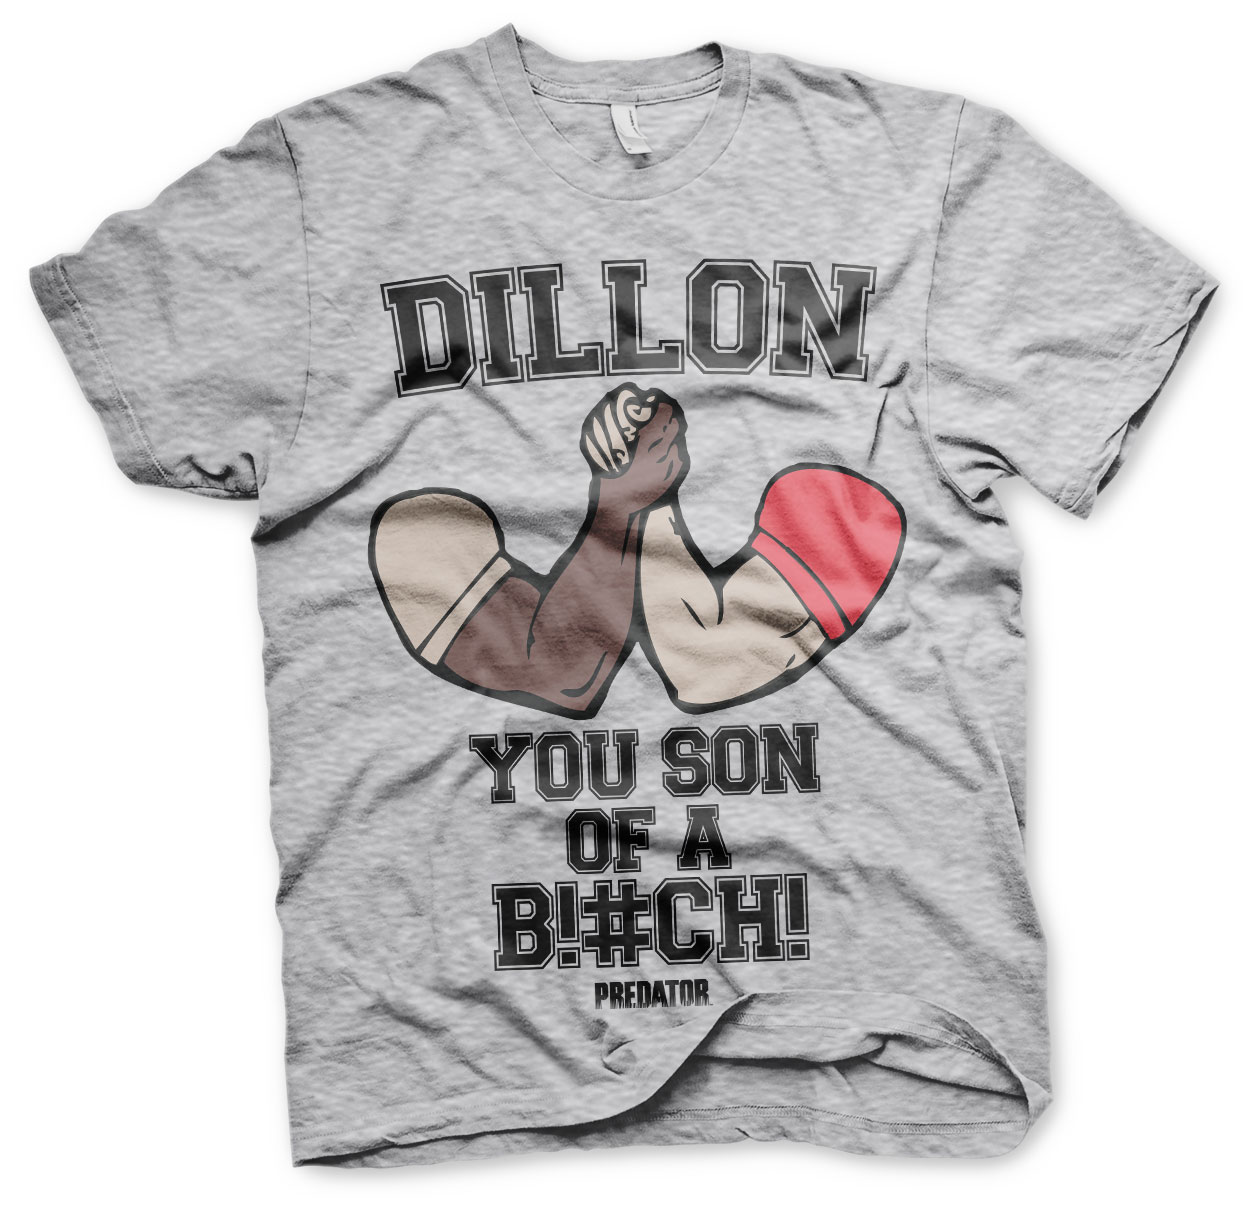 Predator – Dillon T-shirt